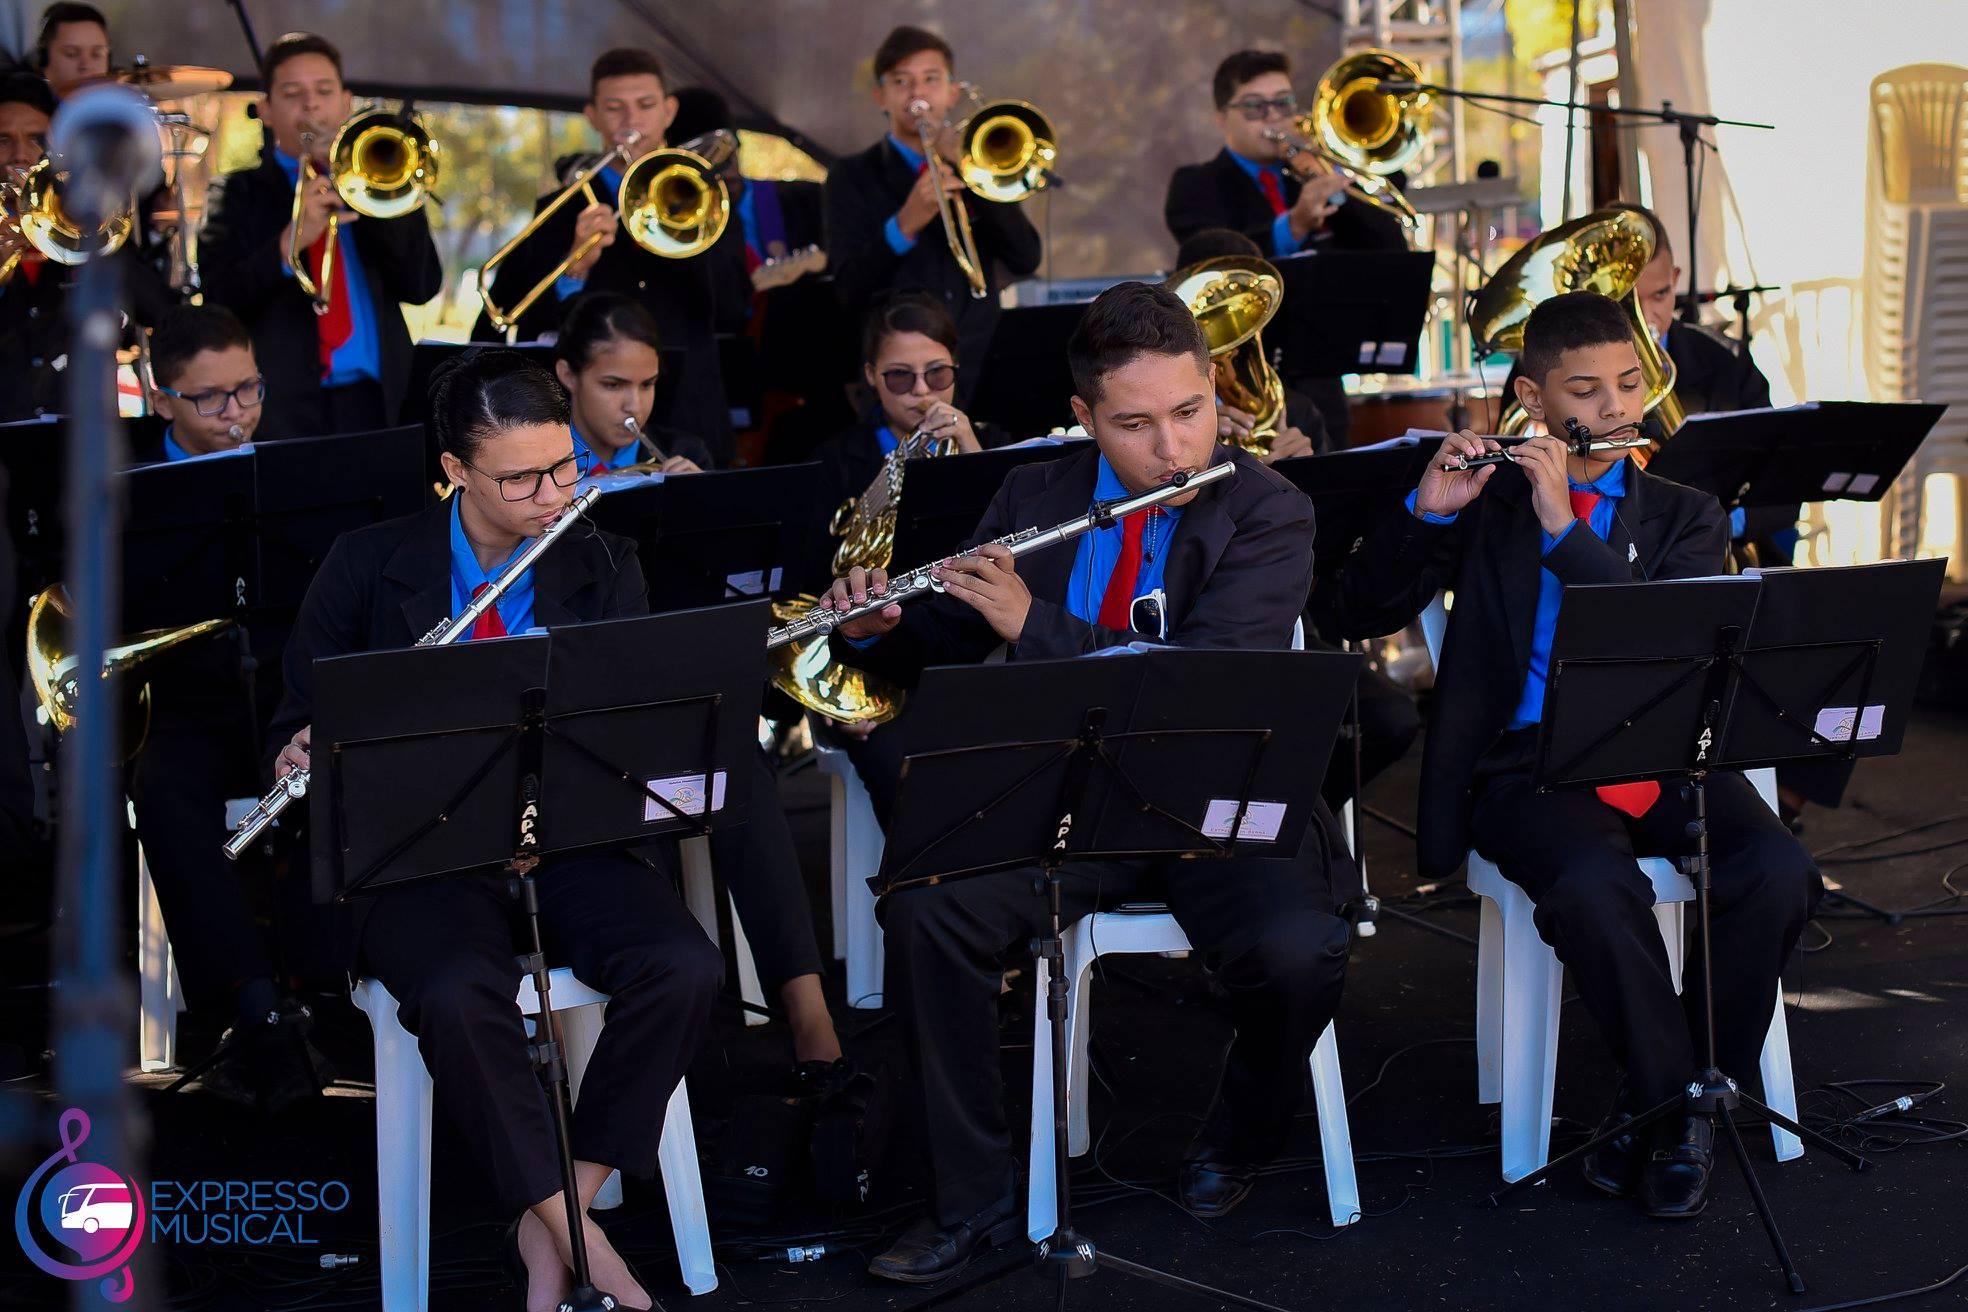 Clássicos na Lagoa apresenta orquestra de alunos de escolas públicas